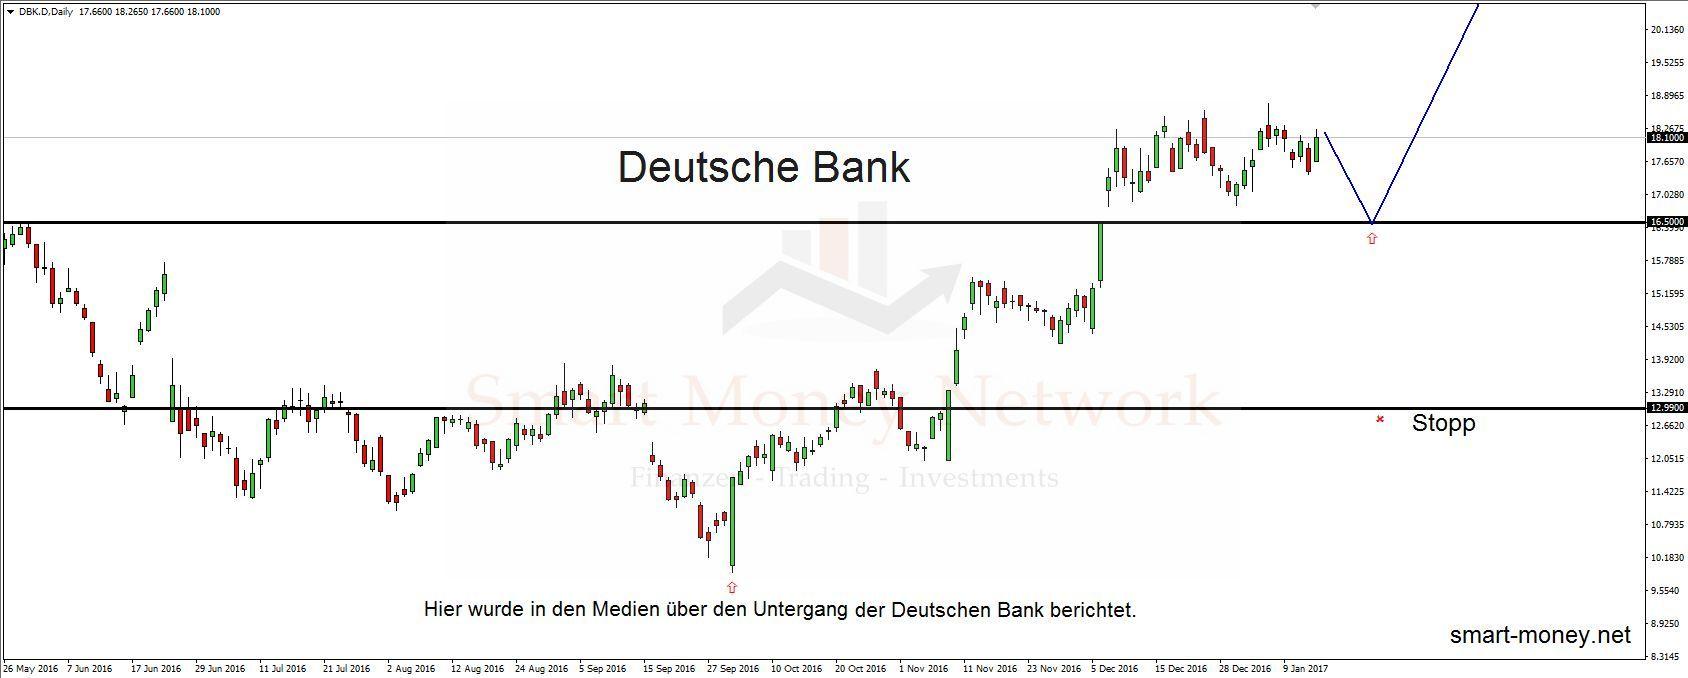 deutsche_bank09.01.17